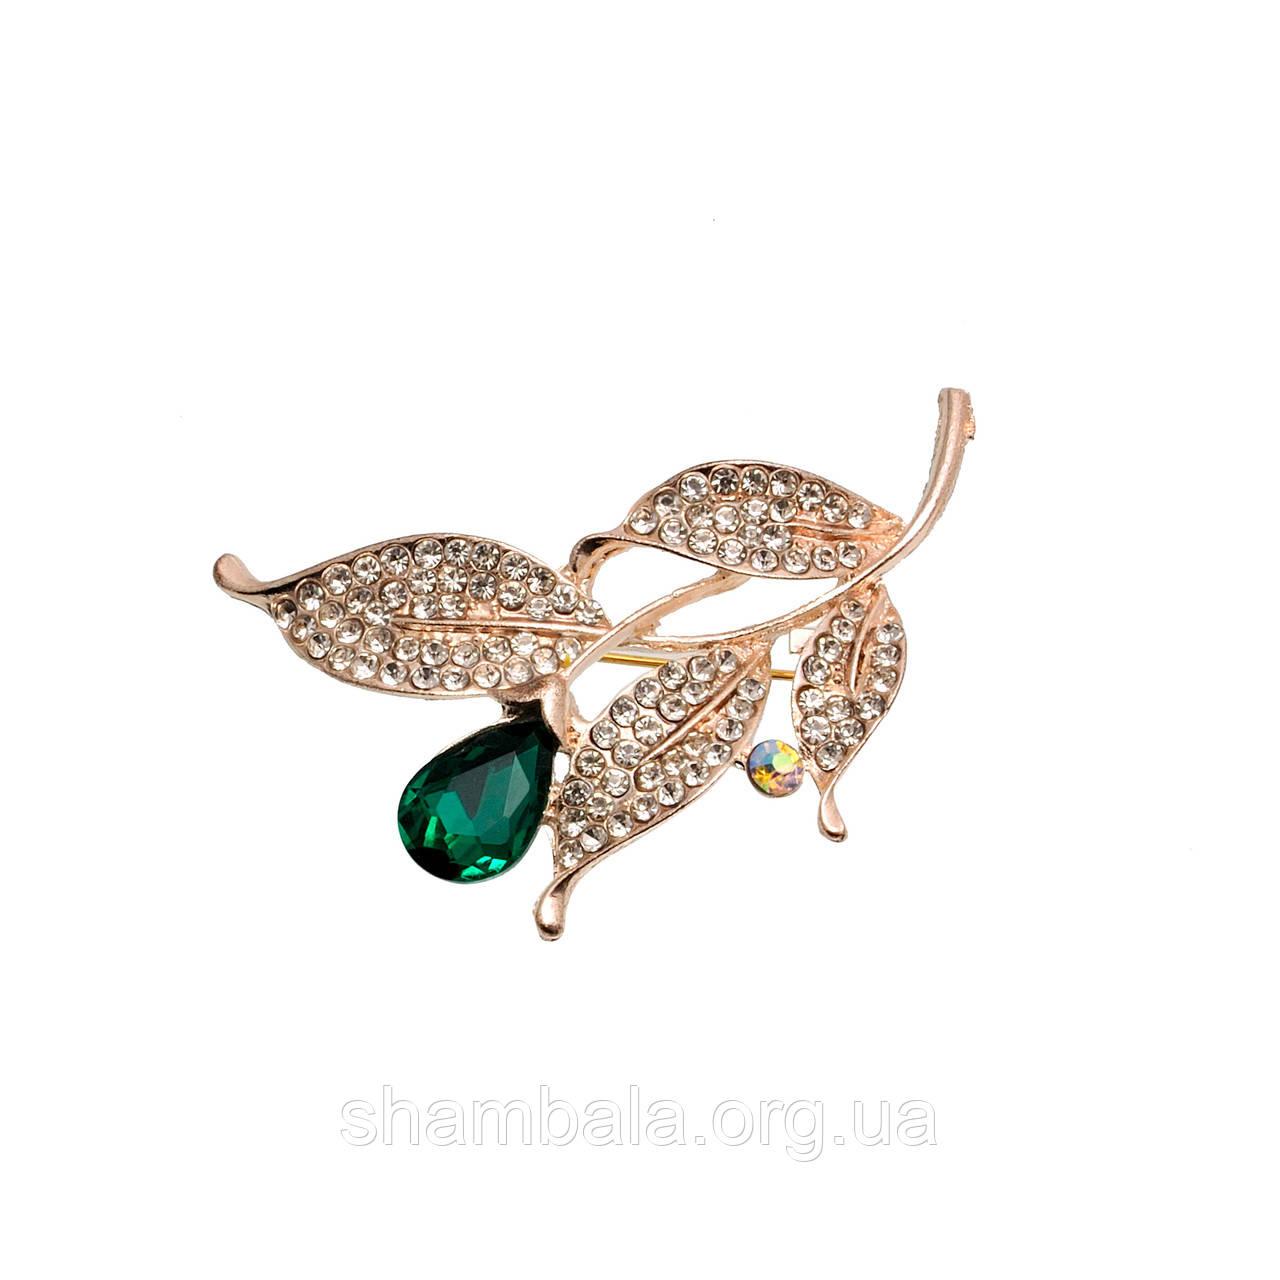 "Брошь Fashion Jewerly ""Ветка с зеленым камнем"" (050072)"